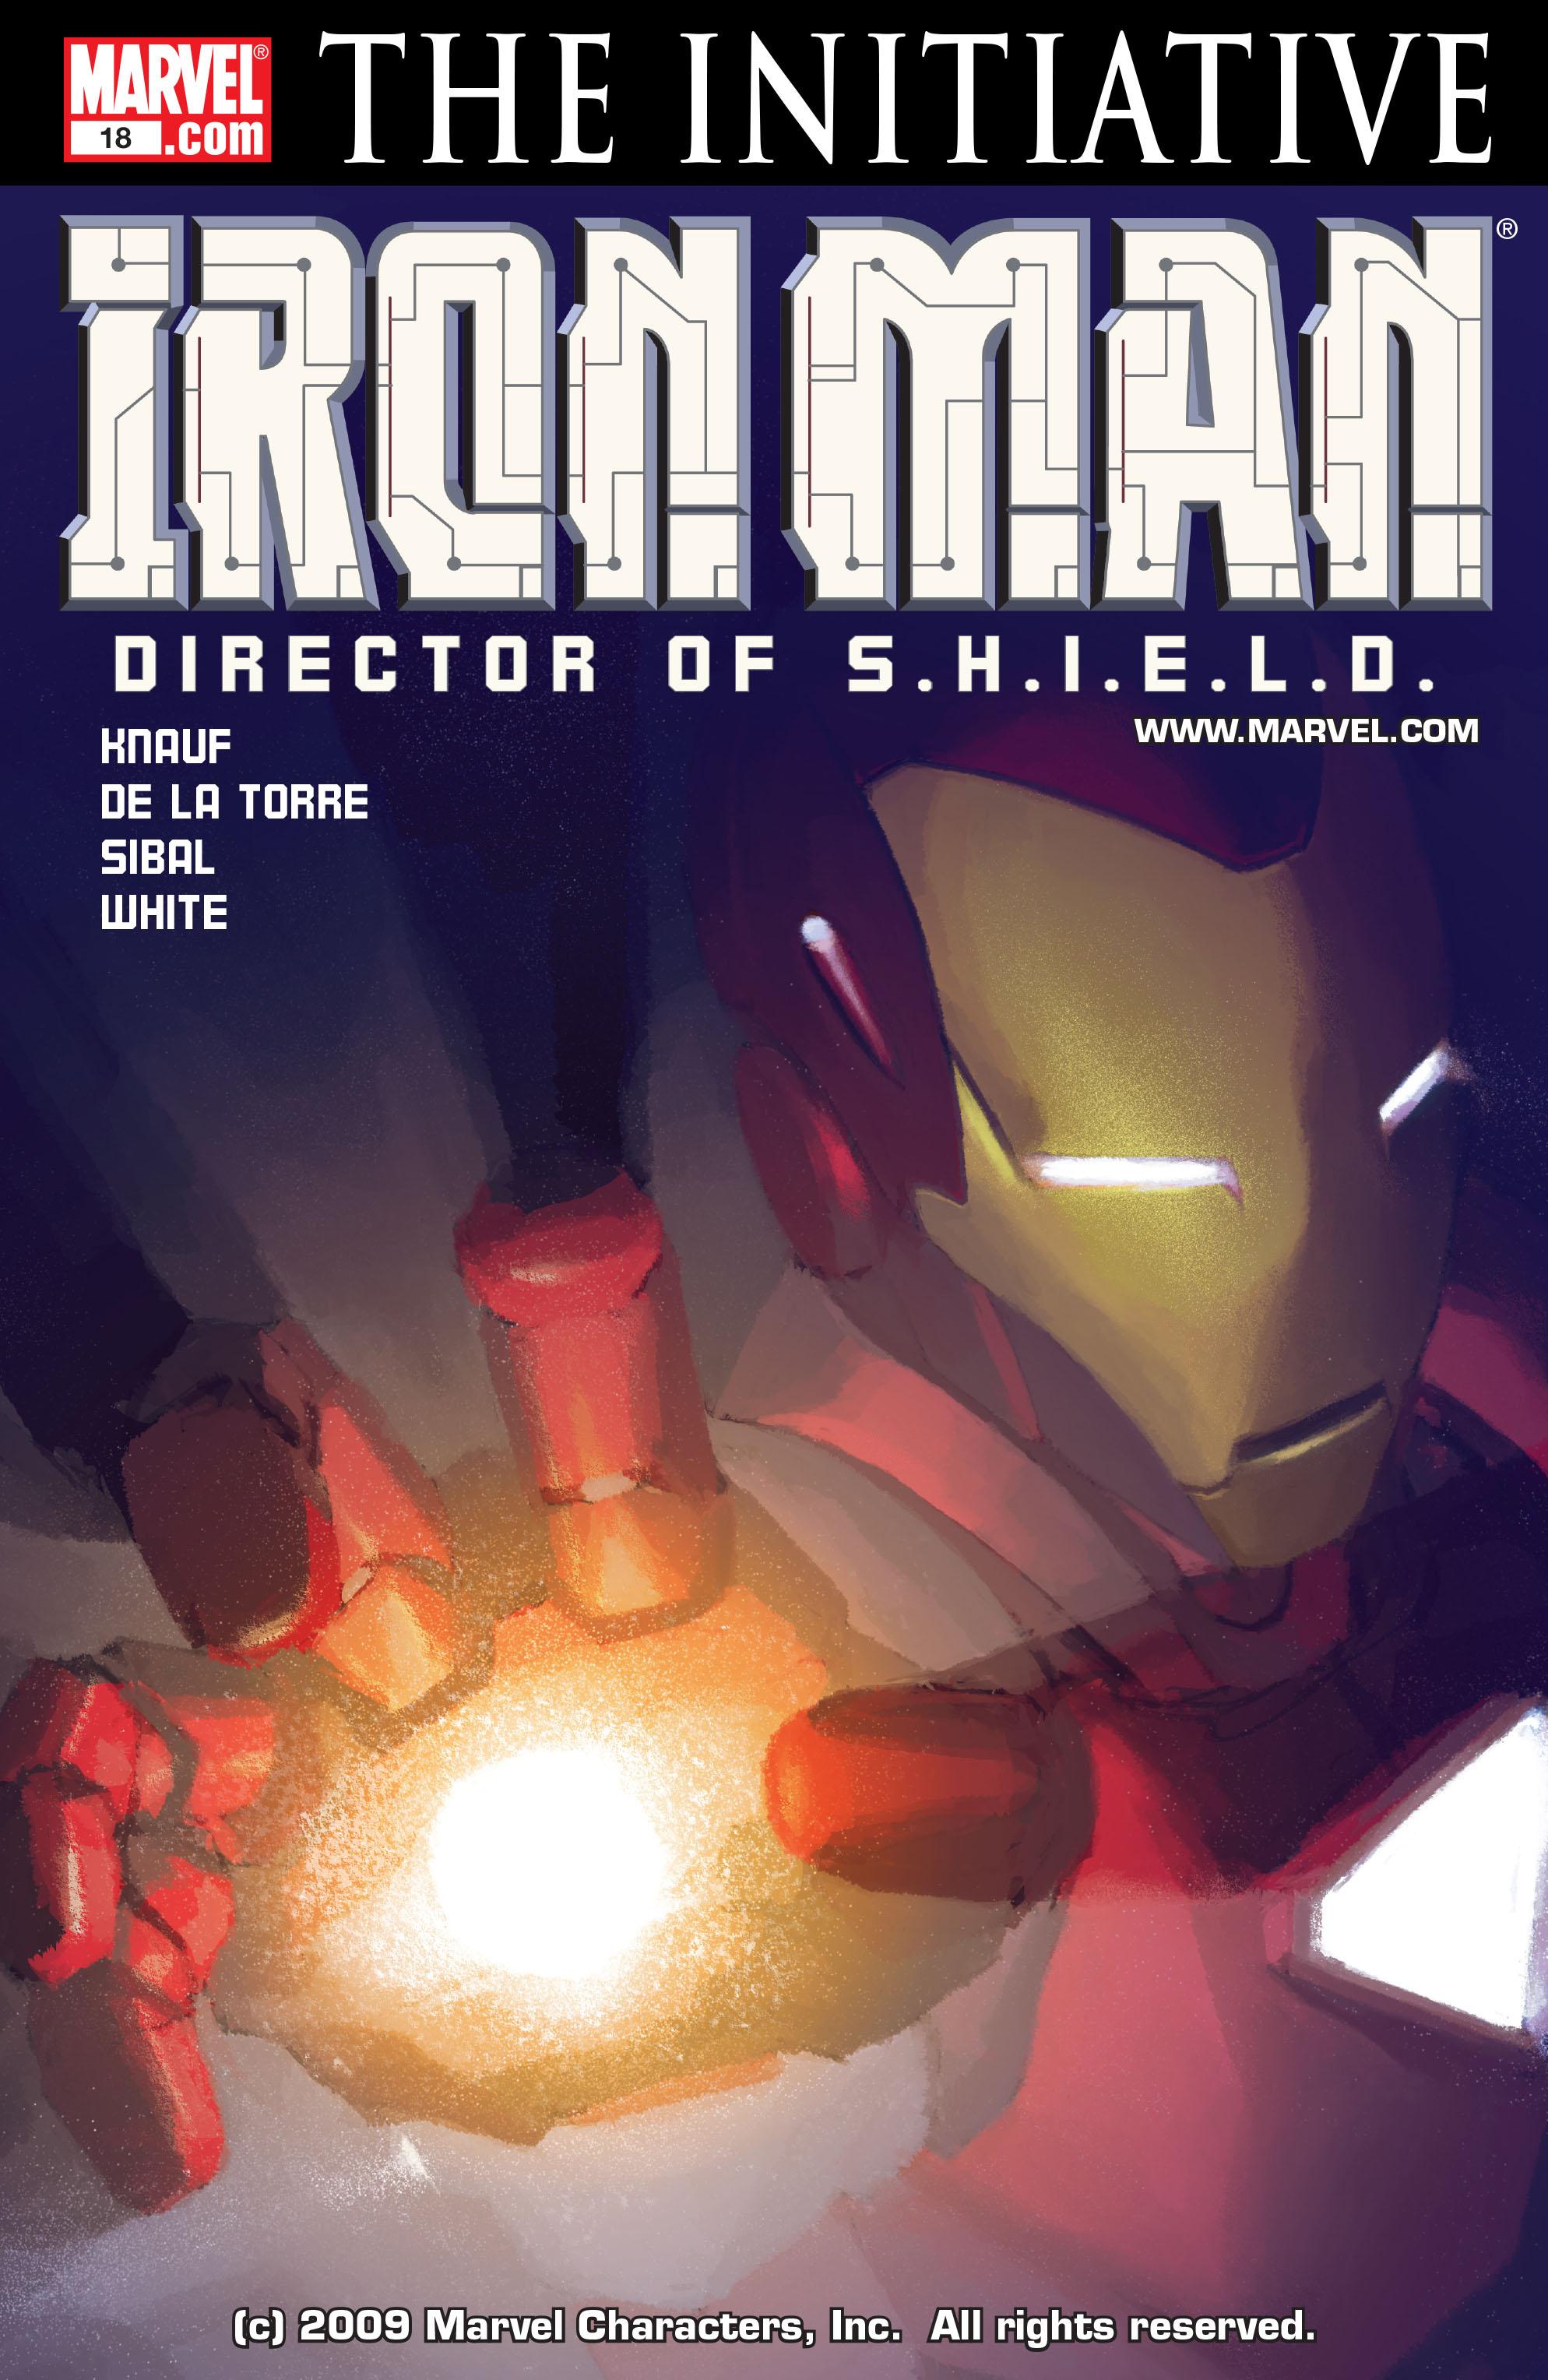 File:Invincible Iron Man Vol 1 18.jpg